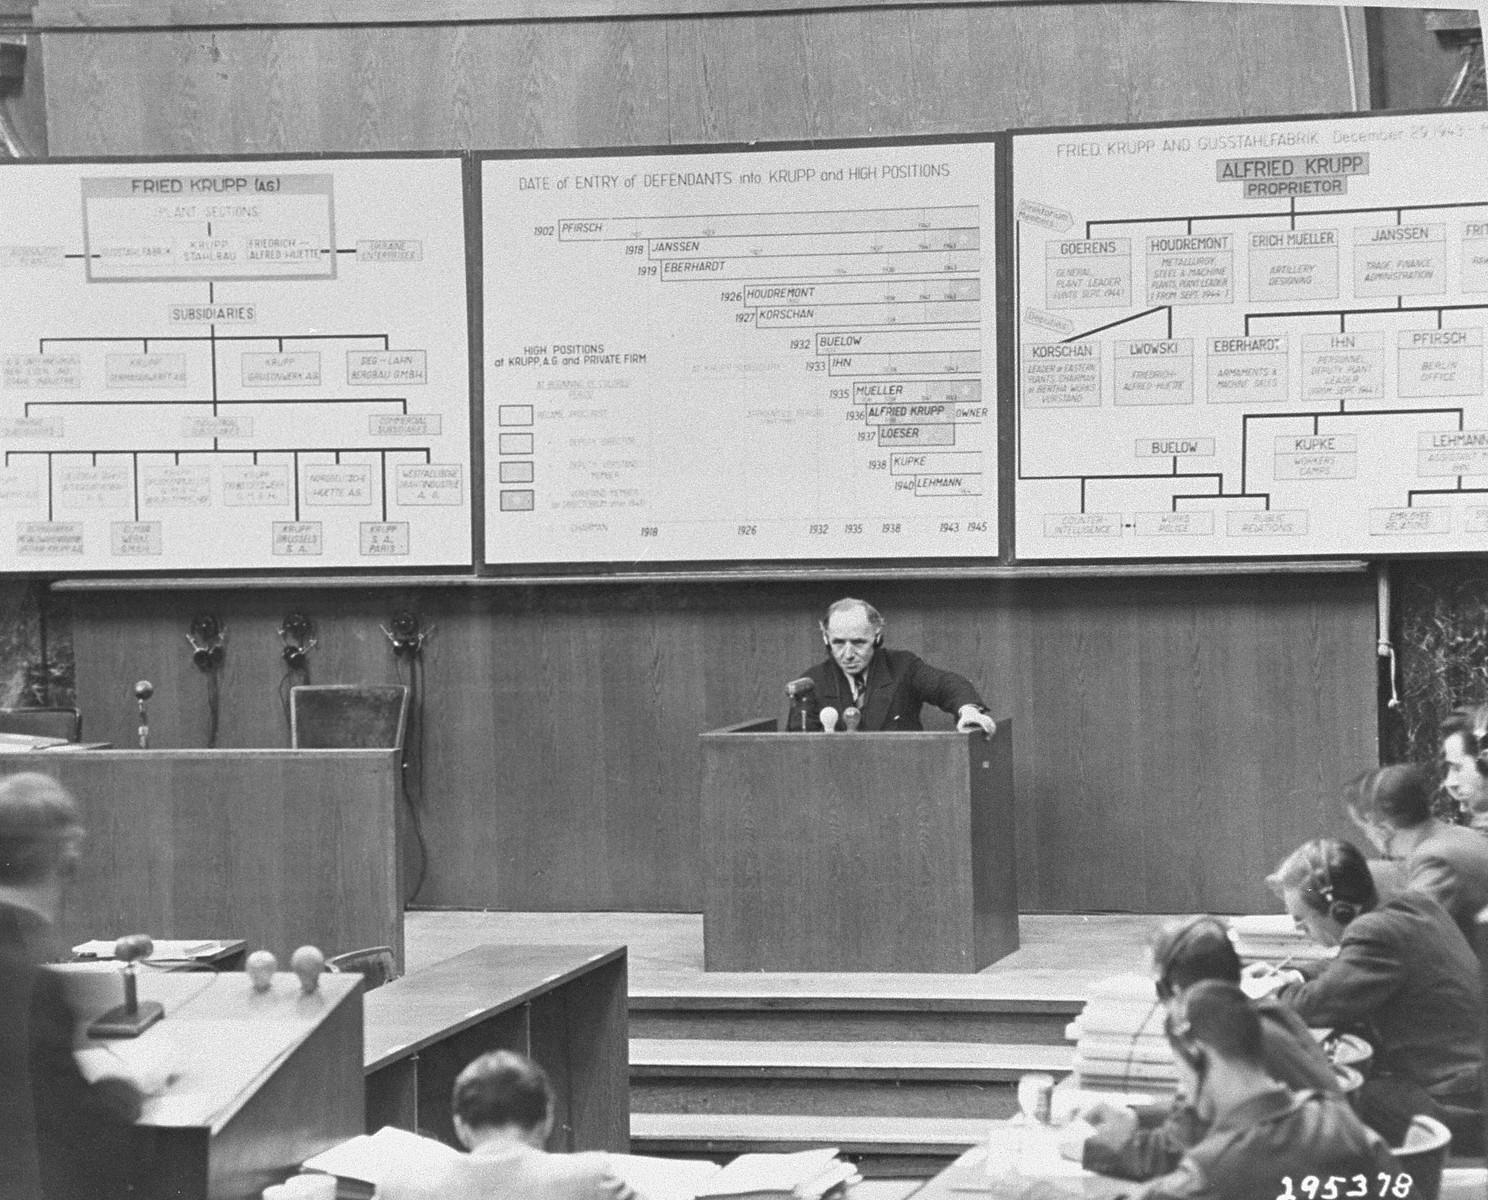 Walter Gumpert testifies during the Krupp Trial.